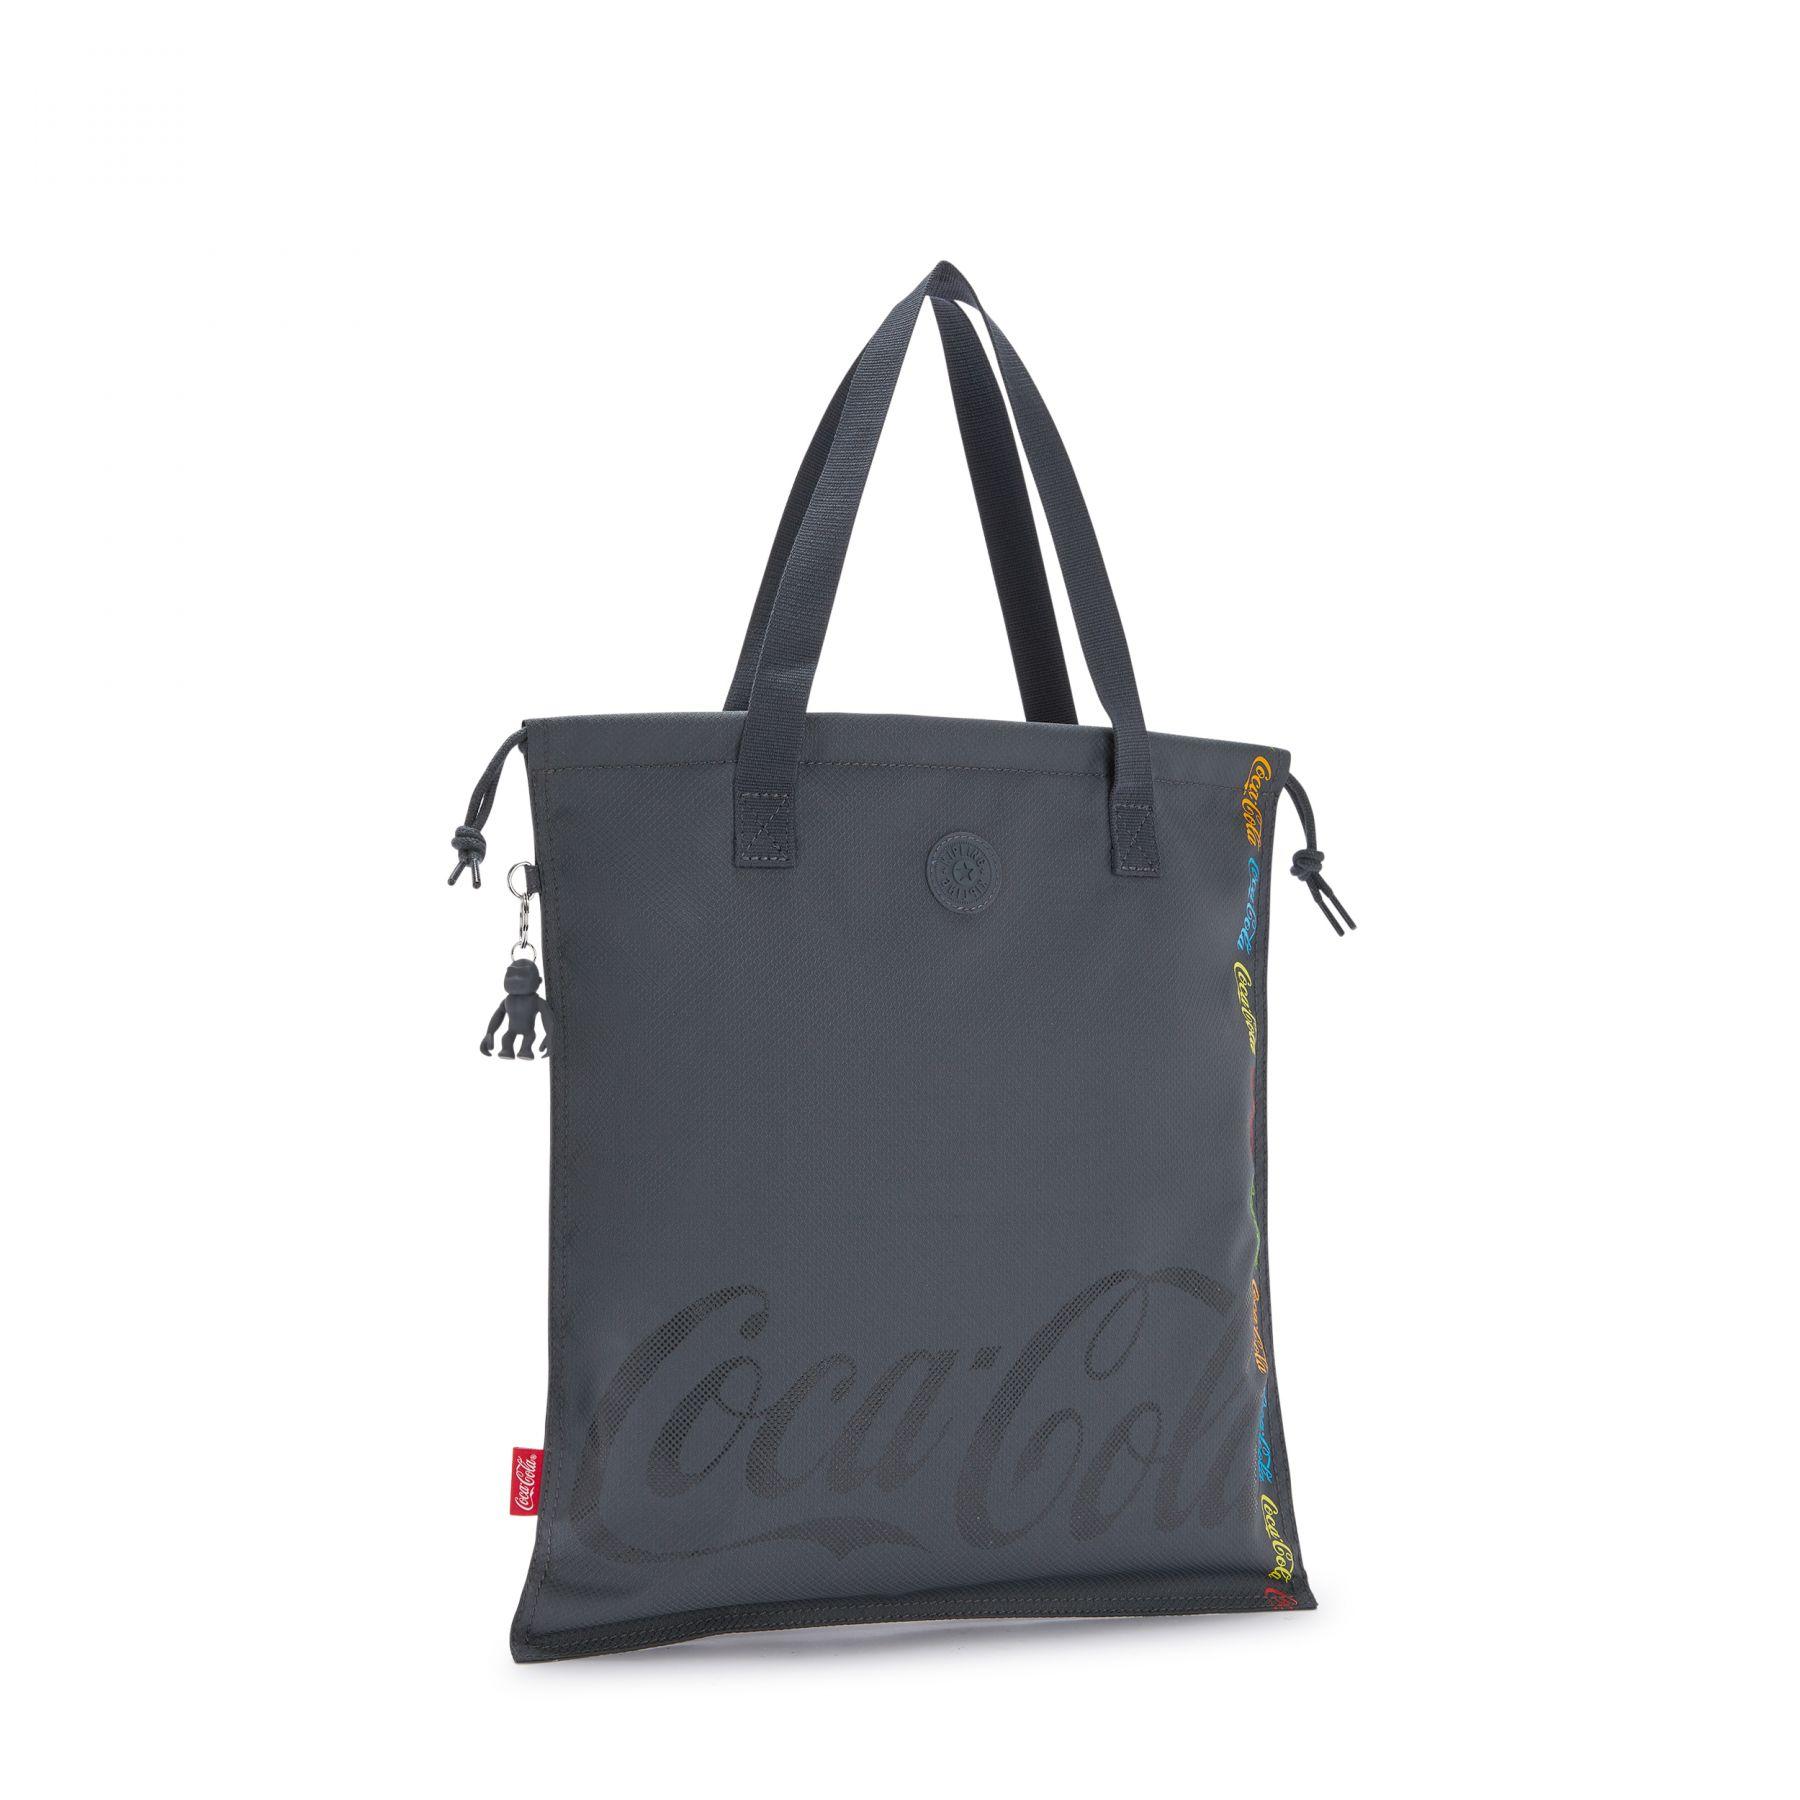 NEW HIPHURRAY BAGS by Kipling